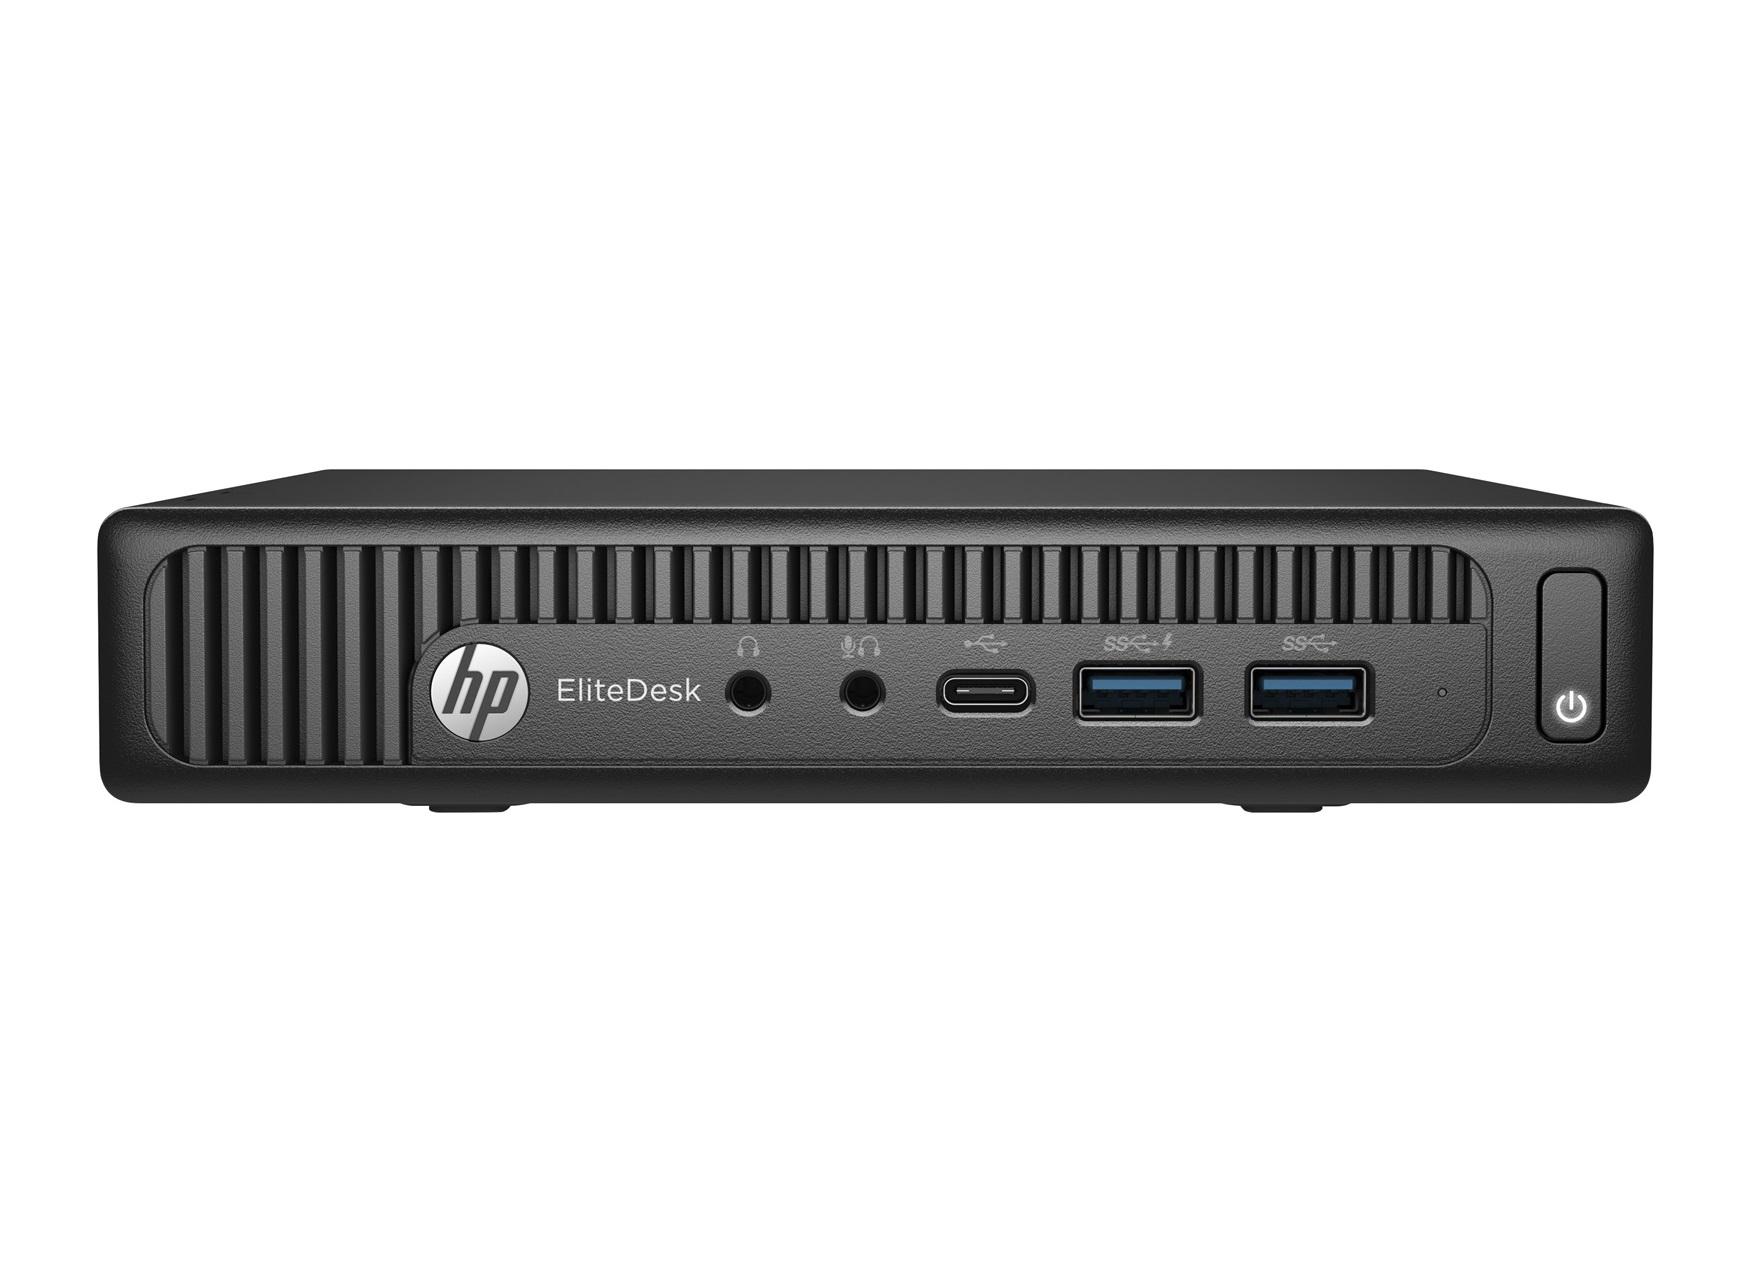 HP EliteDesk 800 G2 DM (Mini) Intel i5-6500T 1x4GB RAM 500GB HDD SATA NO Keyboard NO Mouse WLAN Windows 10 Pro